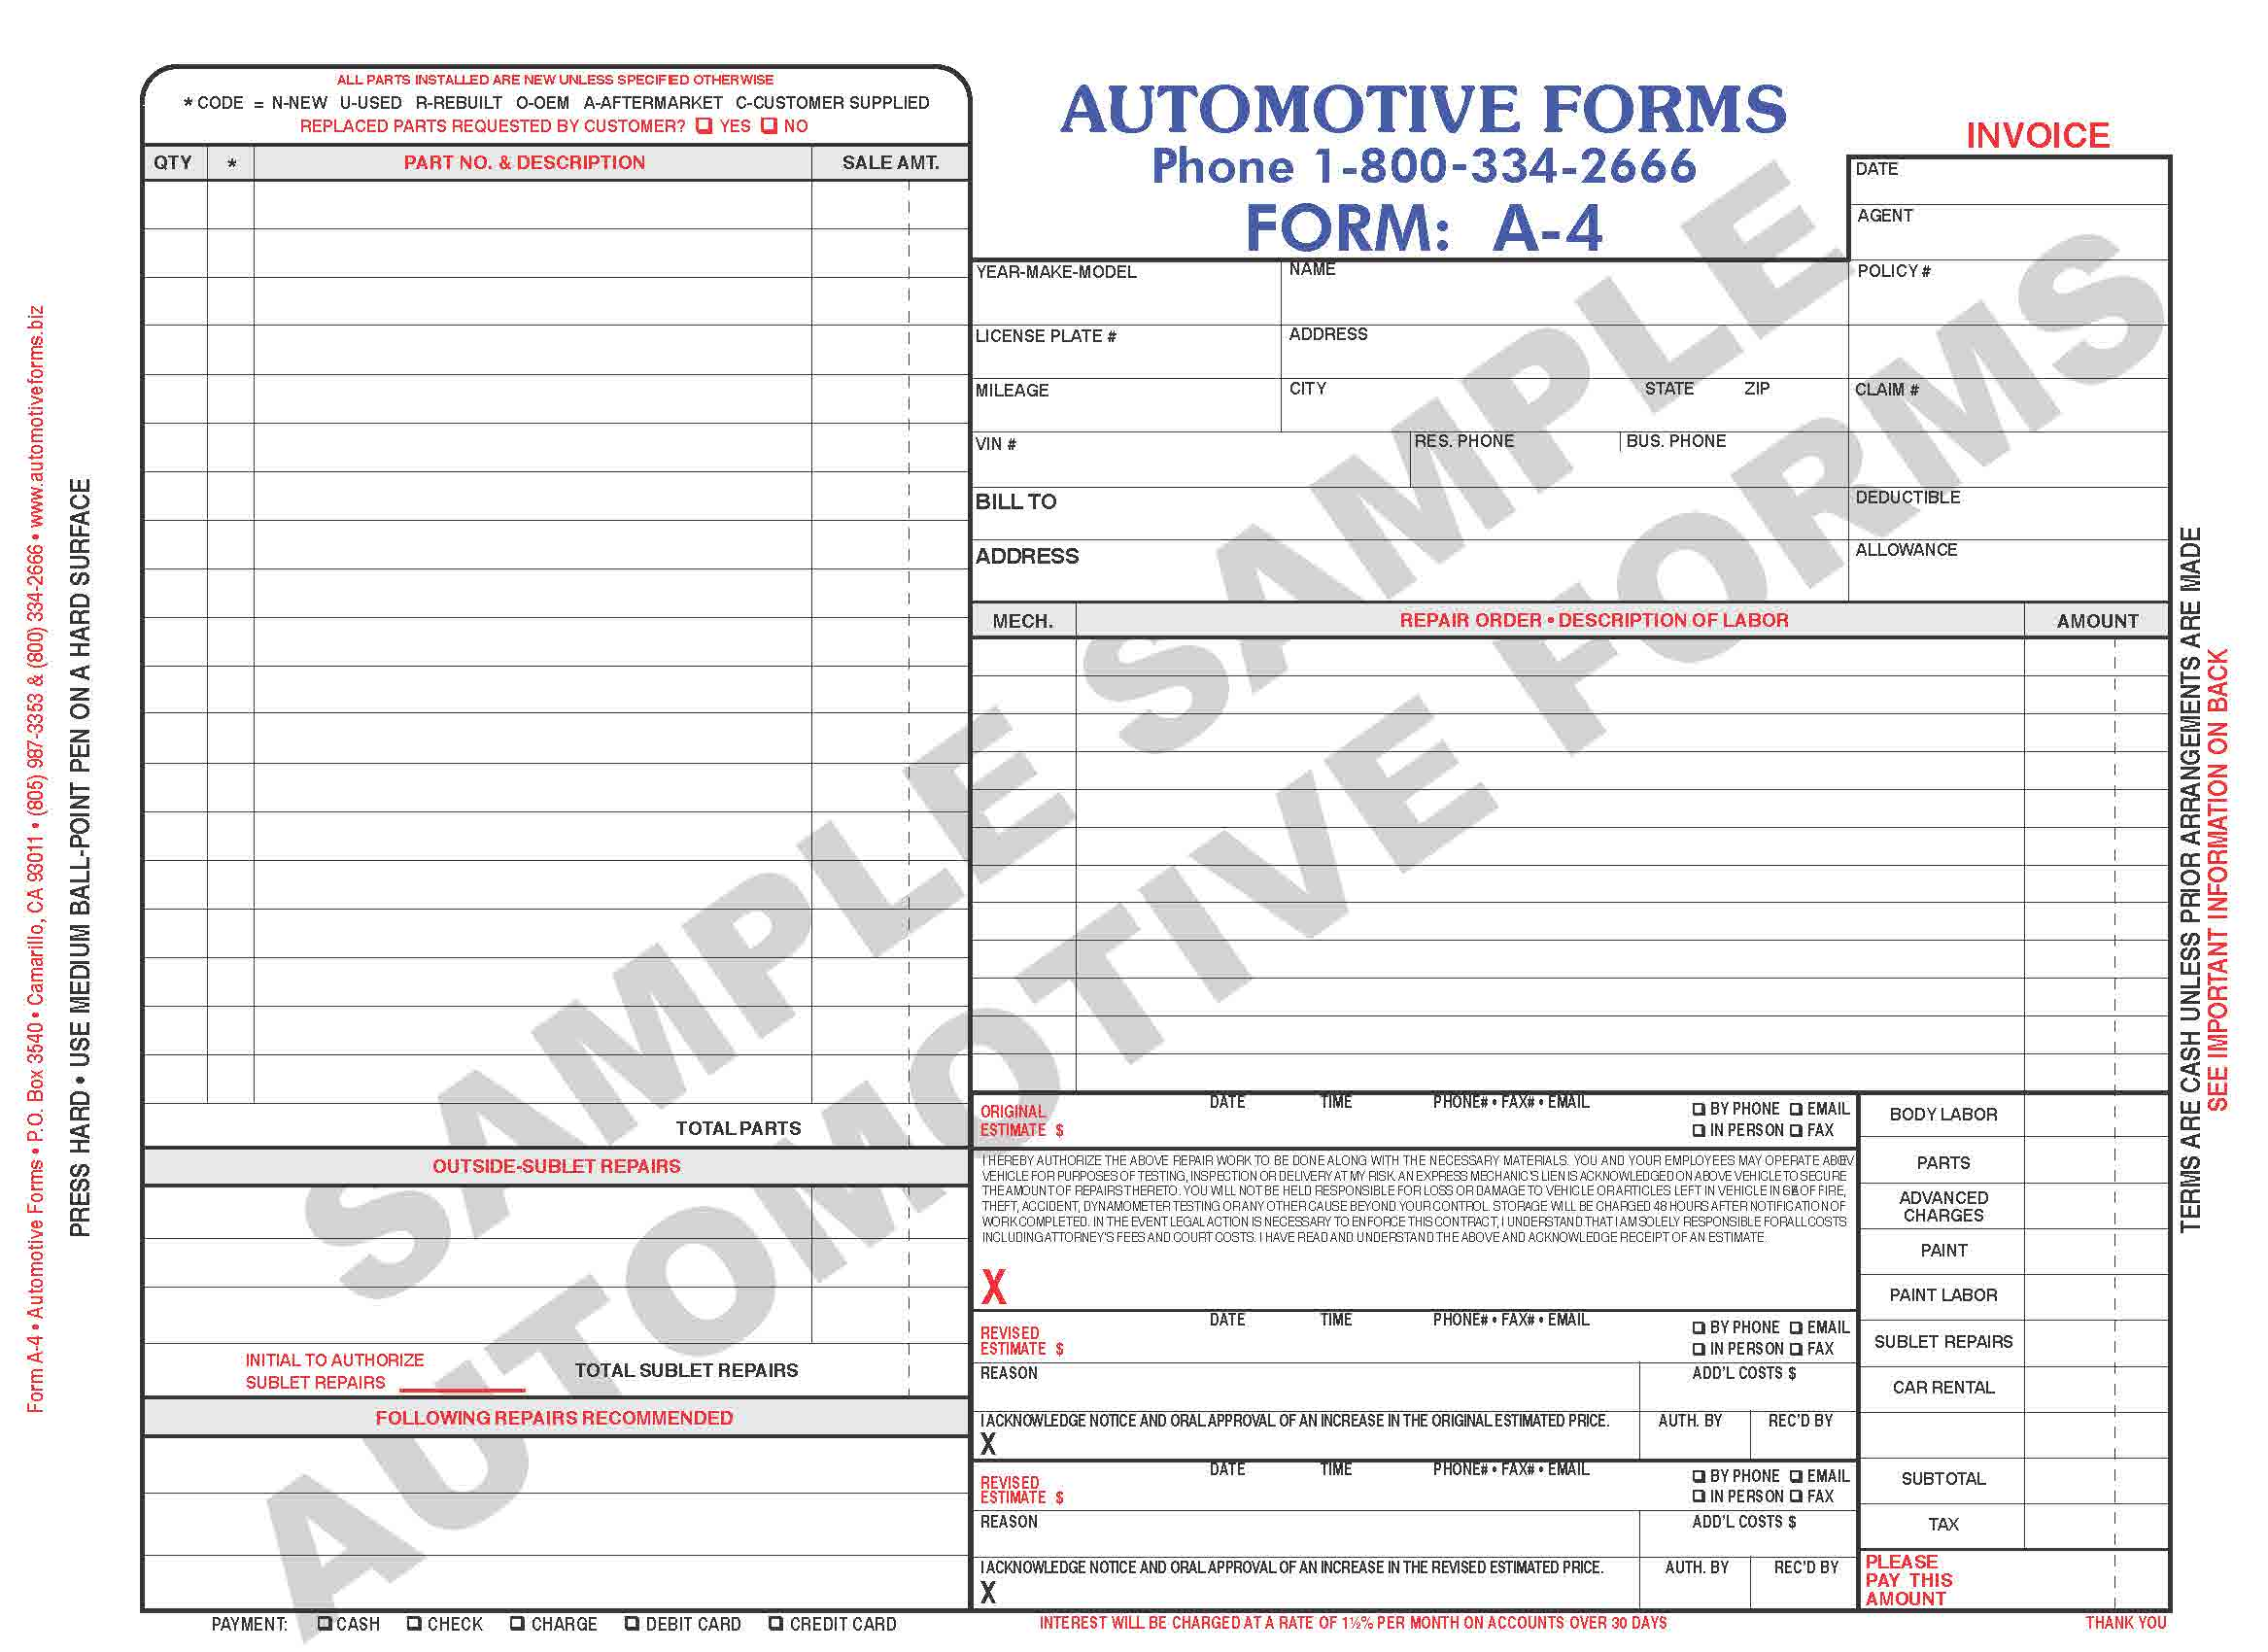 auto body repair invoice template free With body shop invoice